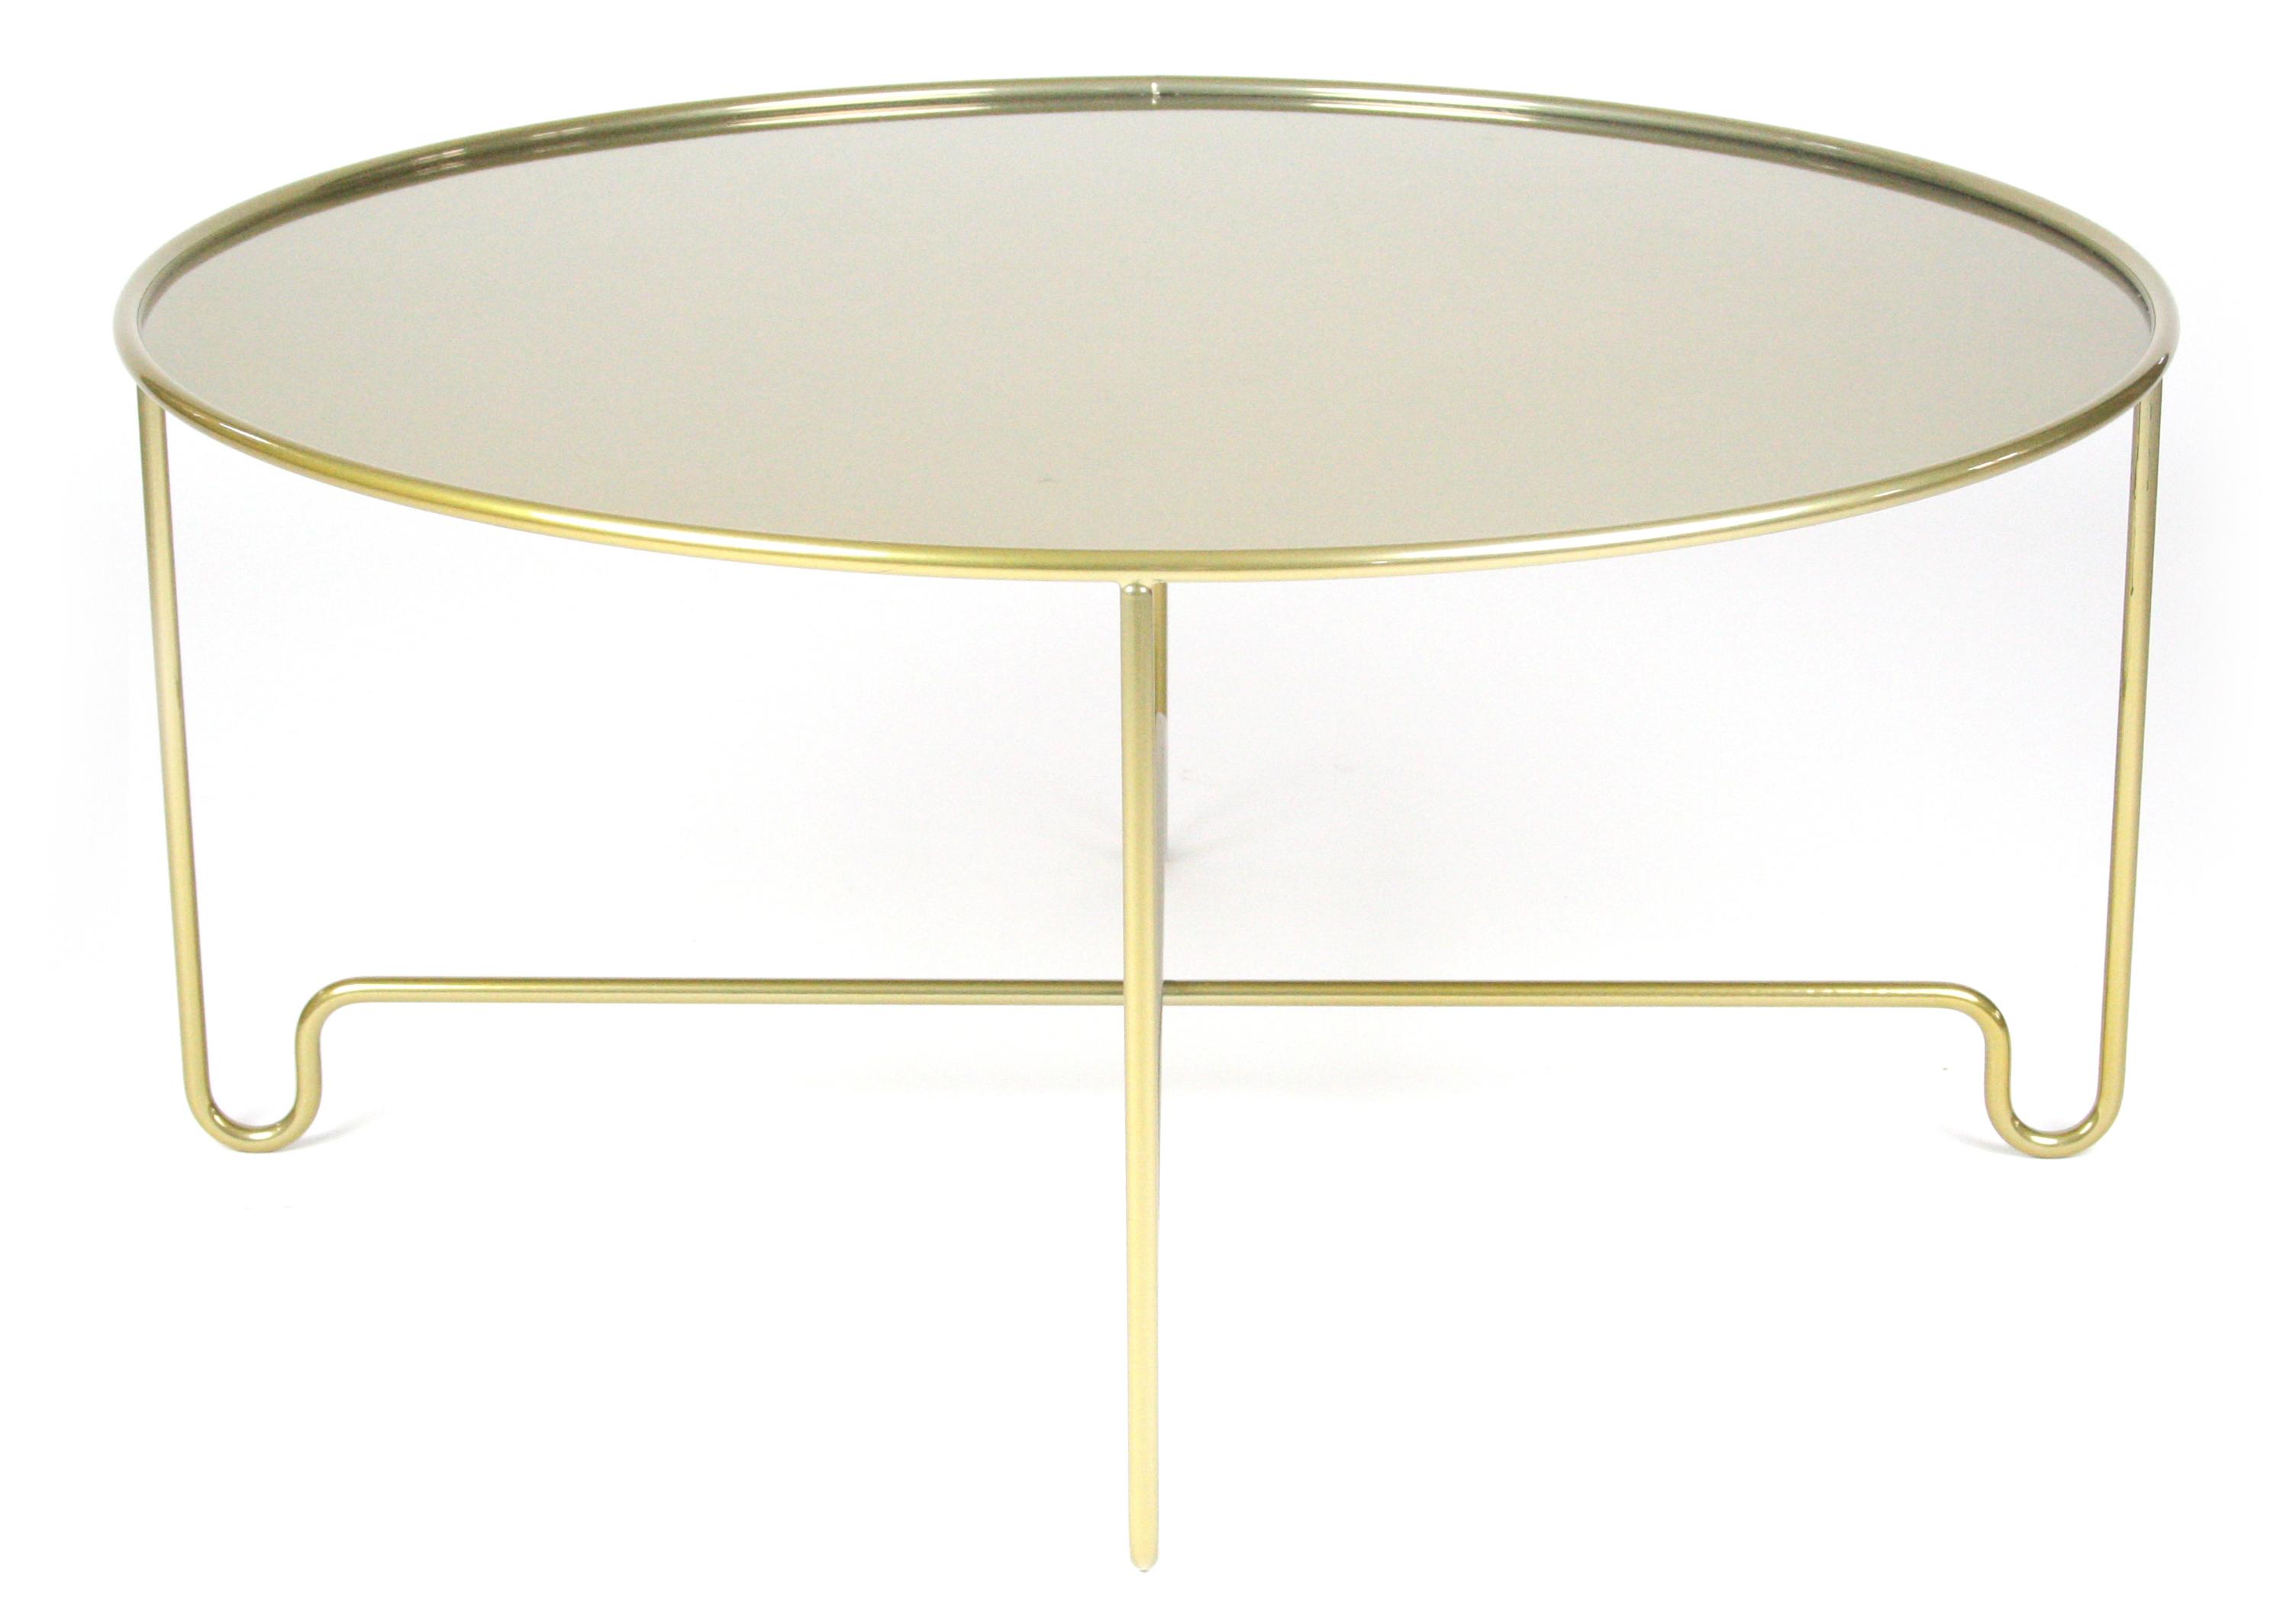 Coco moon soffbord - 110 cm, Champagne